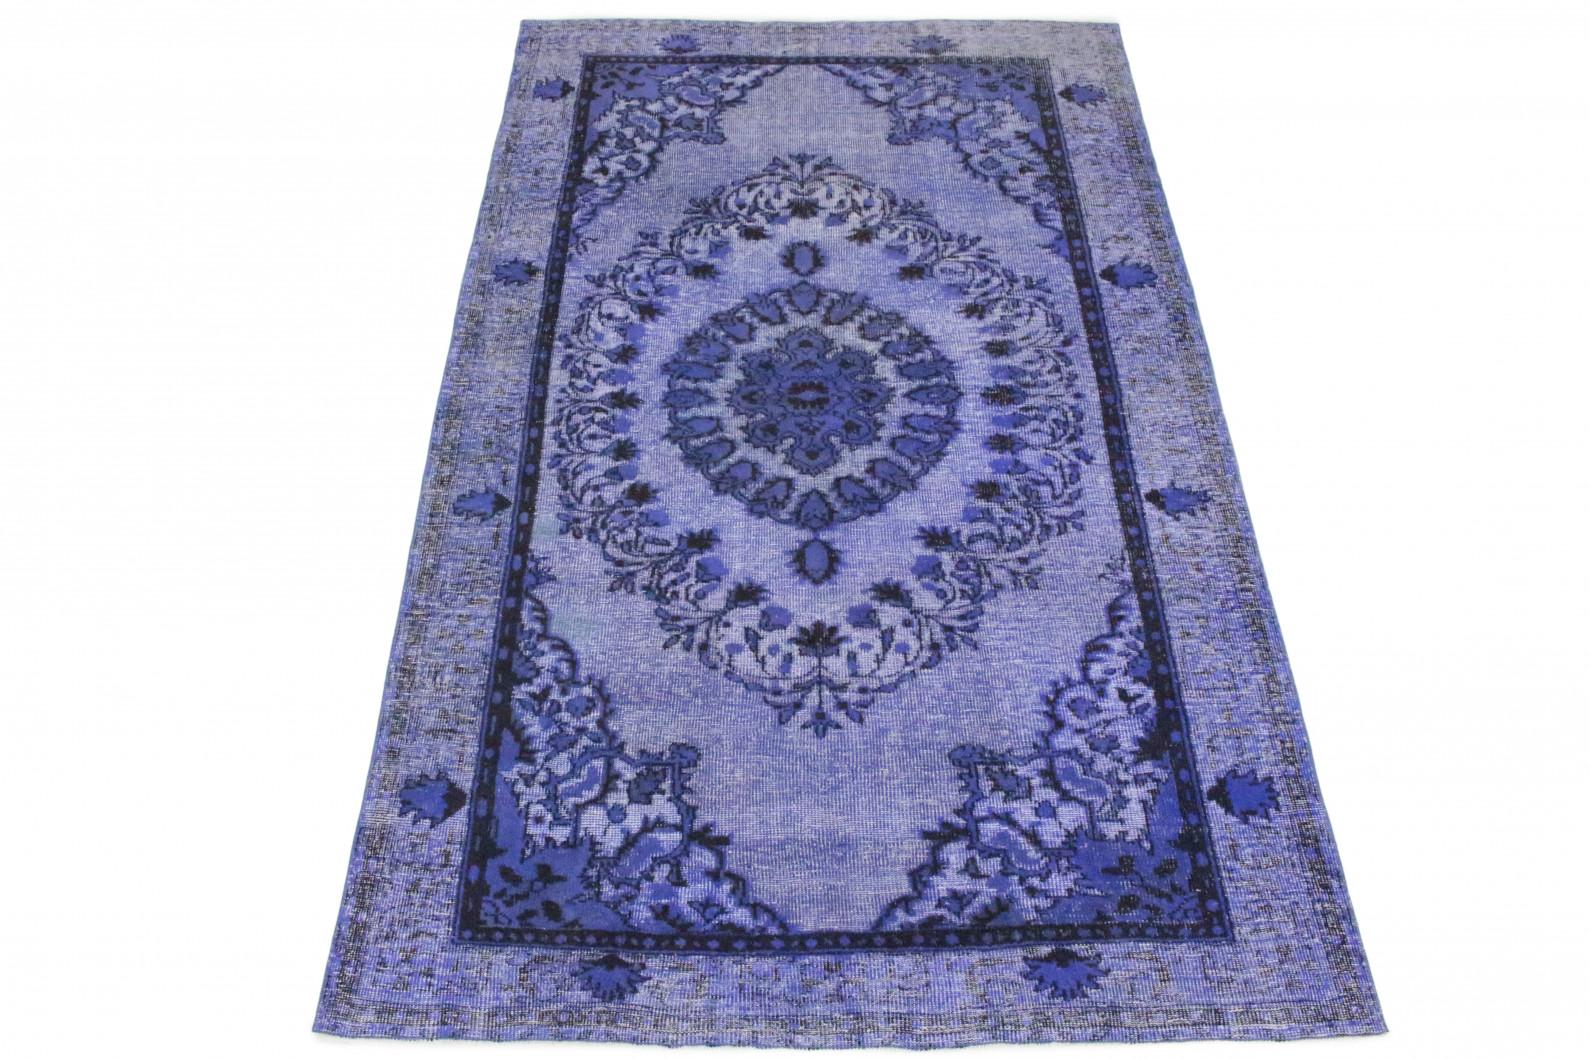 vintage teppich lila in 300x190 1011 3079 bei kaufen. Black Bedroom Furniture Sets. Home Design Ideas